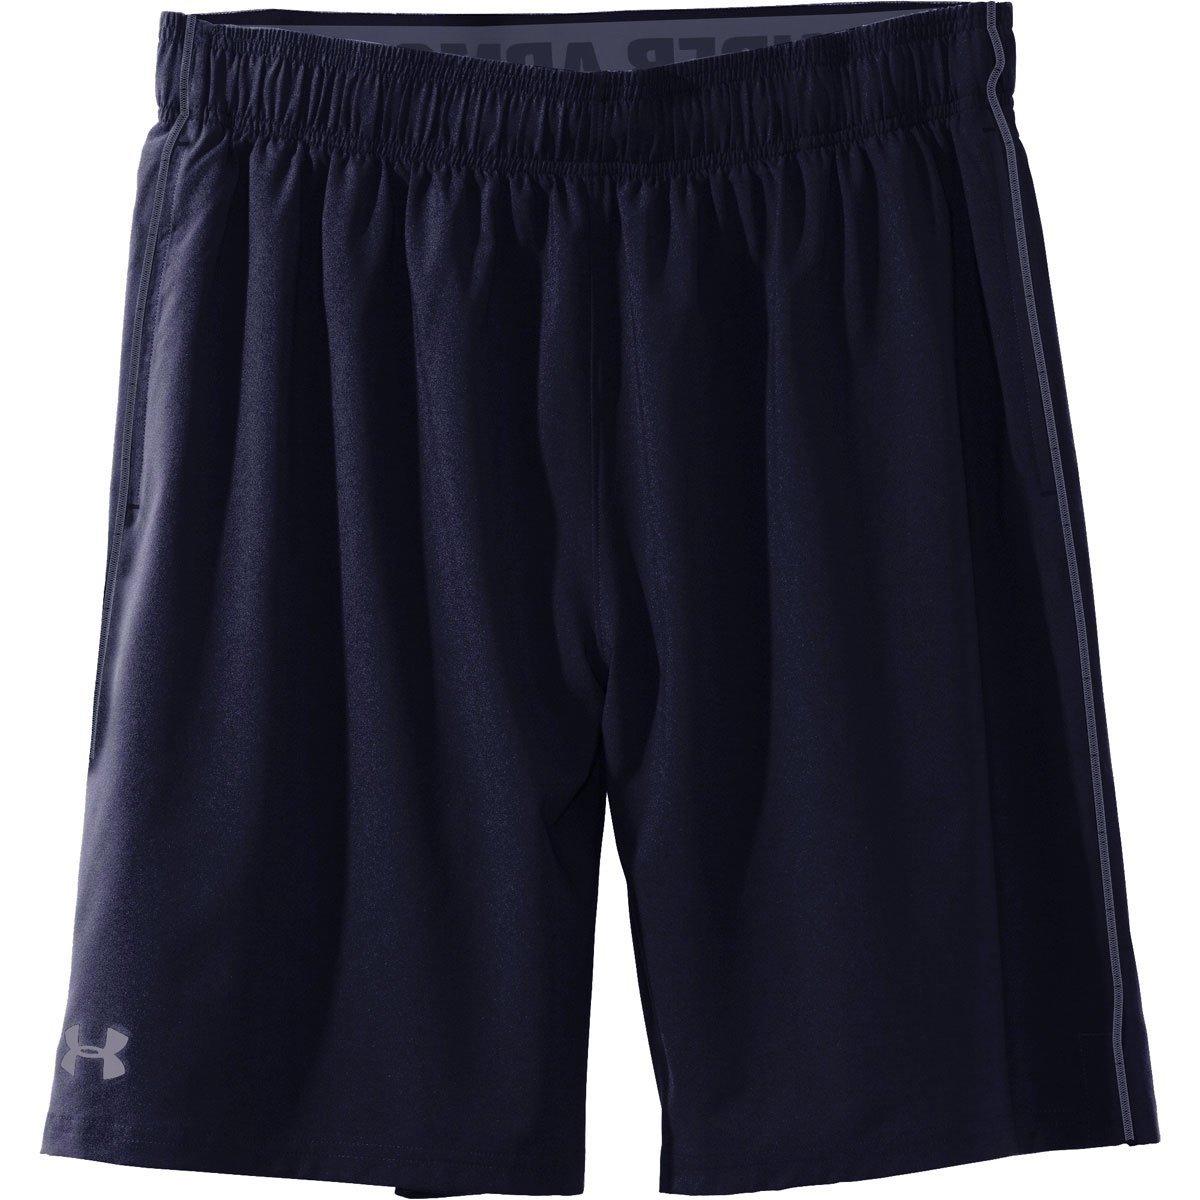 Under Armour Men's UA Raid 10'' Shorts DARK BLUE/Medium by Under Armour